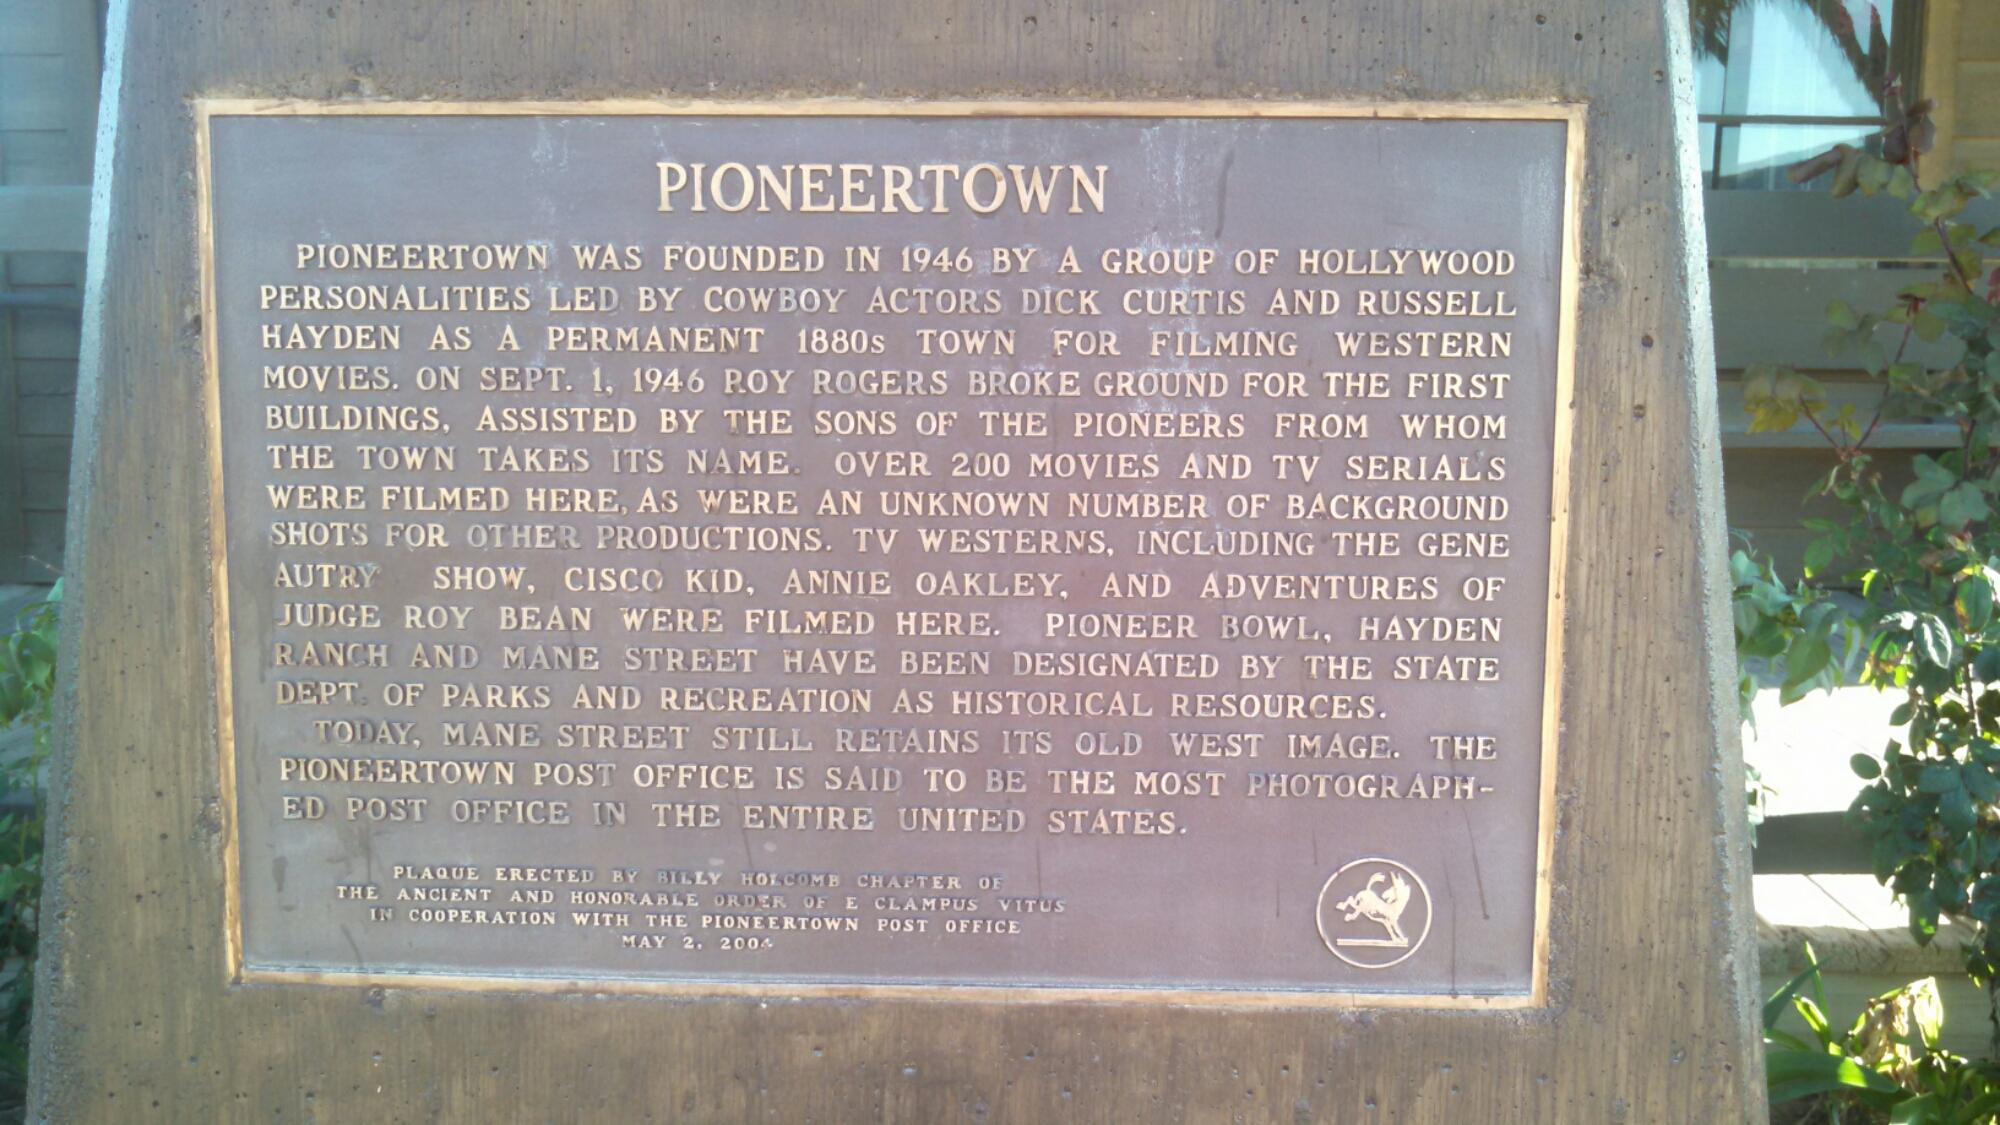 wpid wp 1427040300716 - LFTR - US - CA - Roadside oddities make me happy. Giant Rock, Integratron, Pioneer town